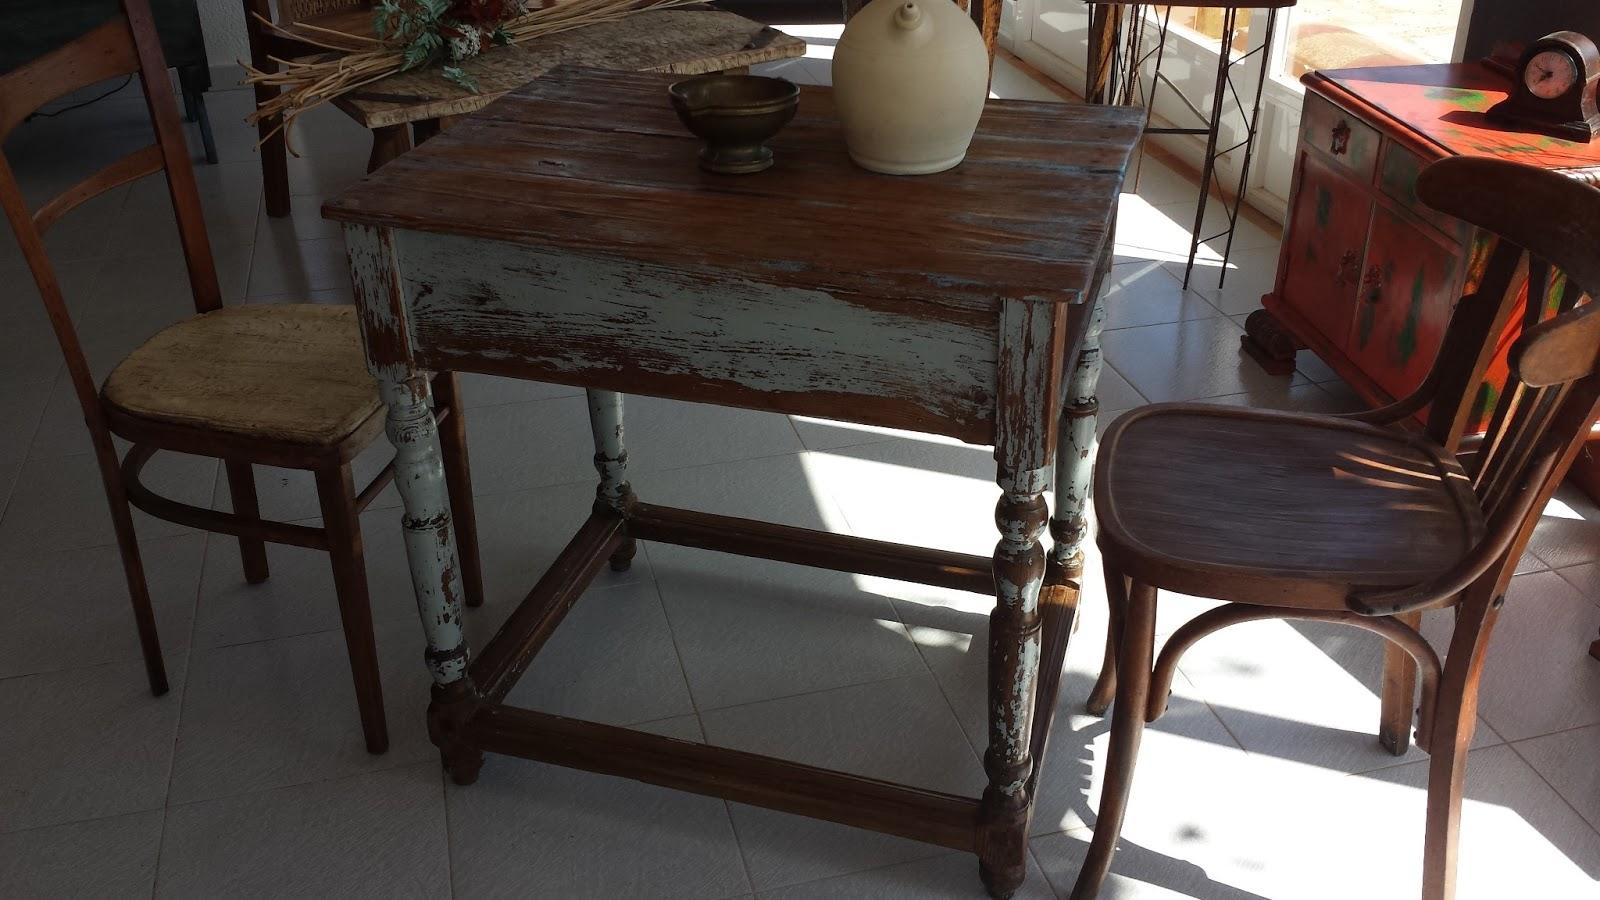 Mesa de cocina pureza de anta o rusticalia decoracion - Mesas rusticas de cocina ...